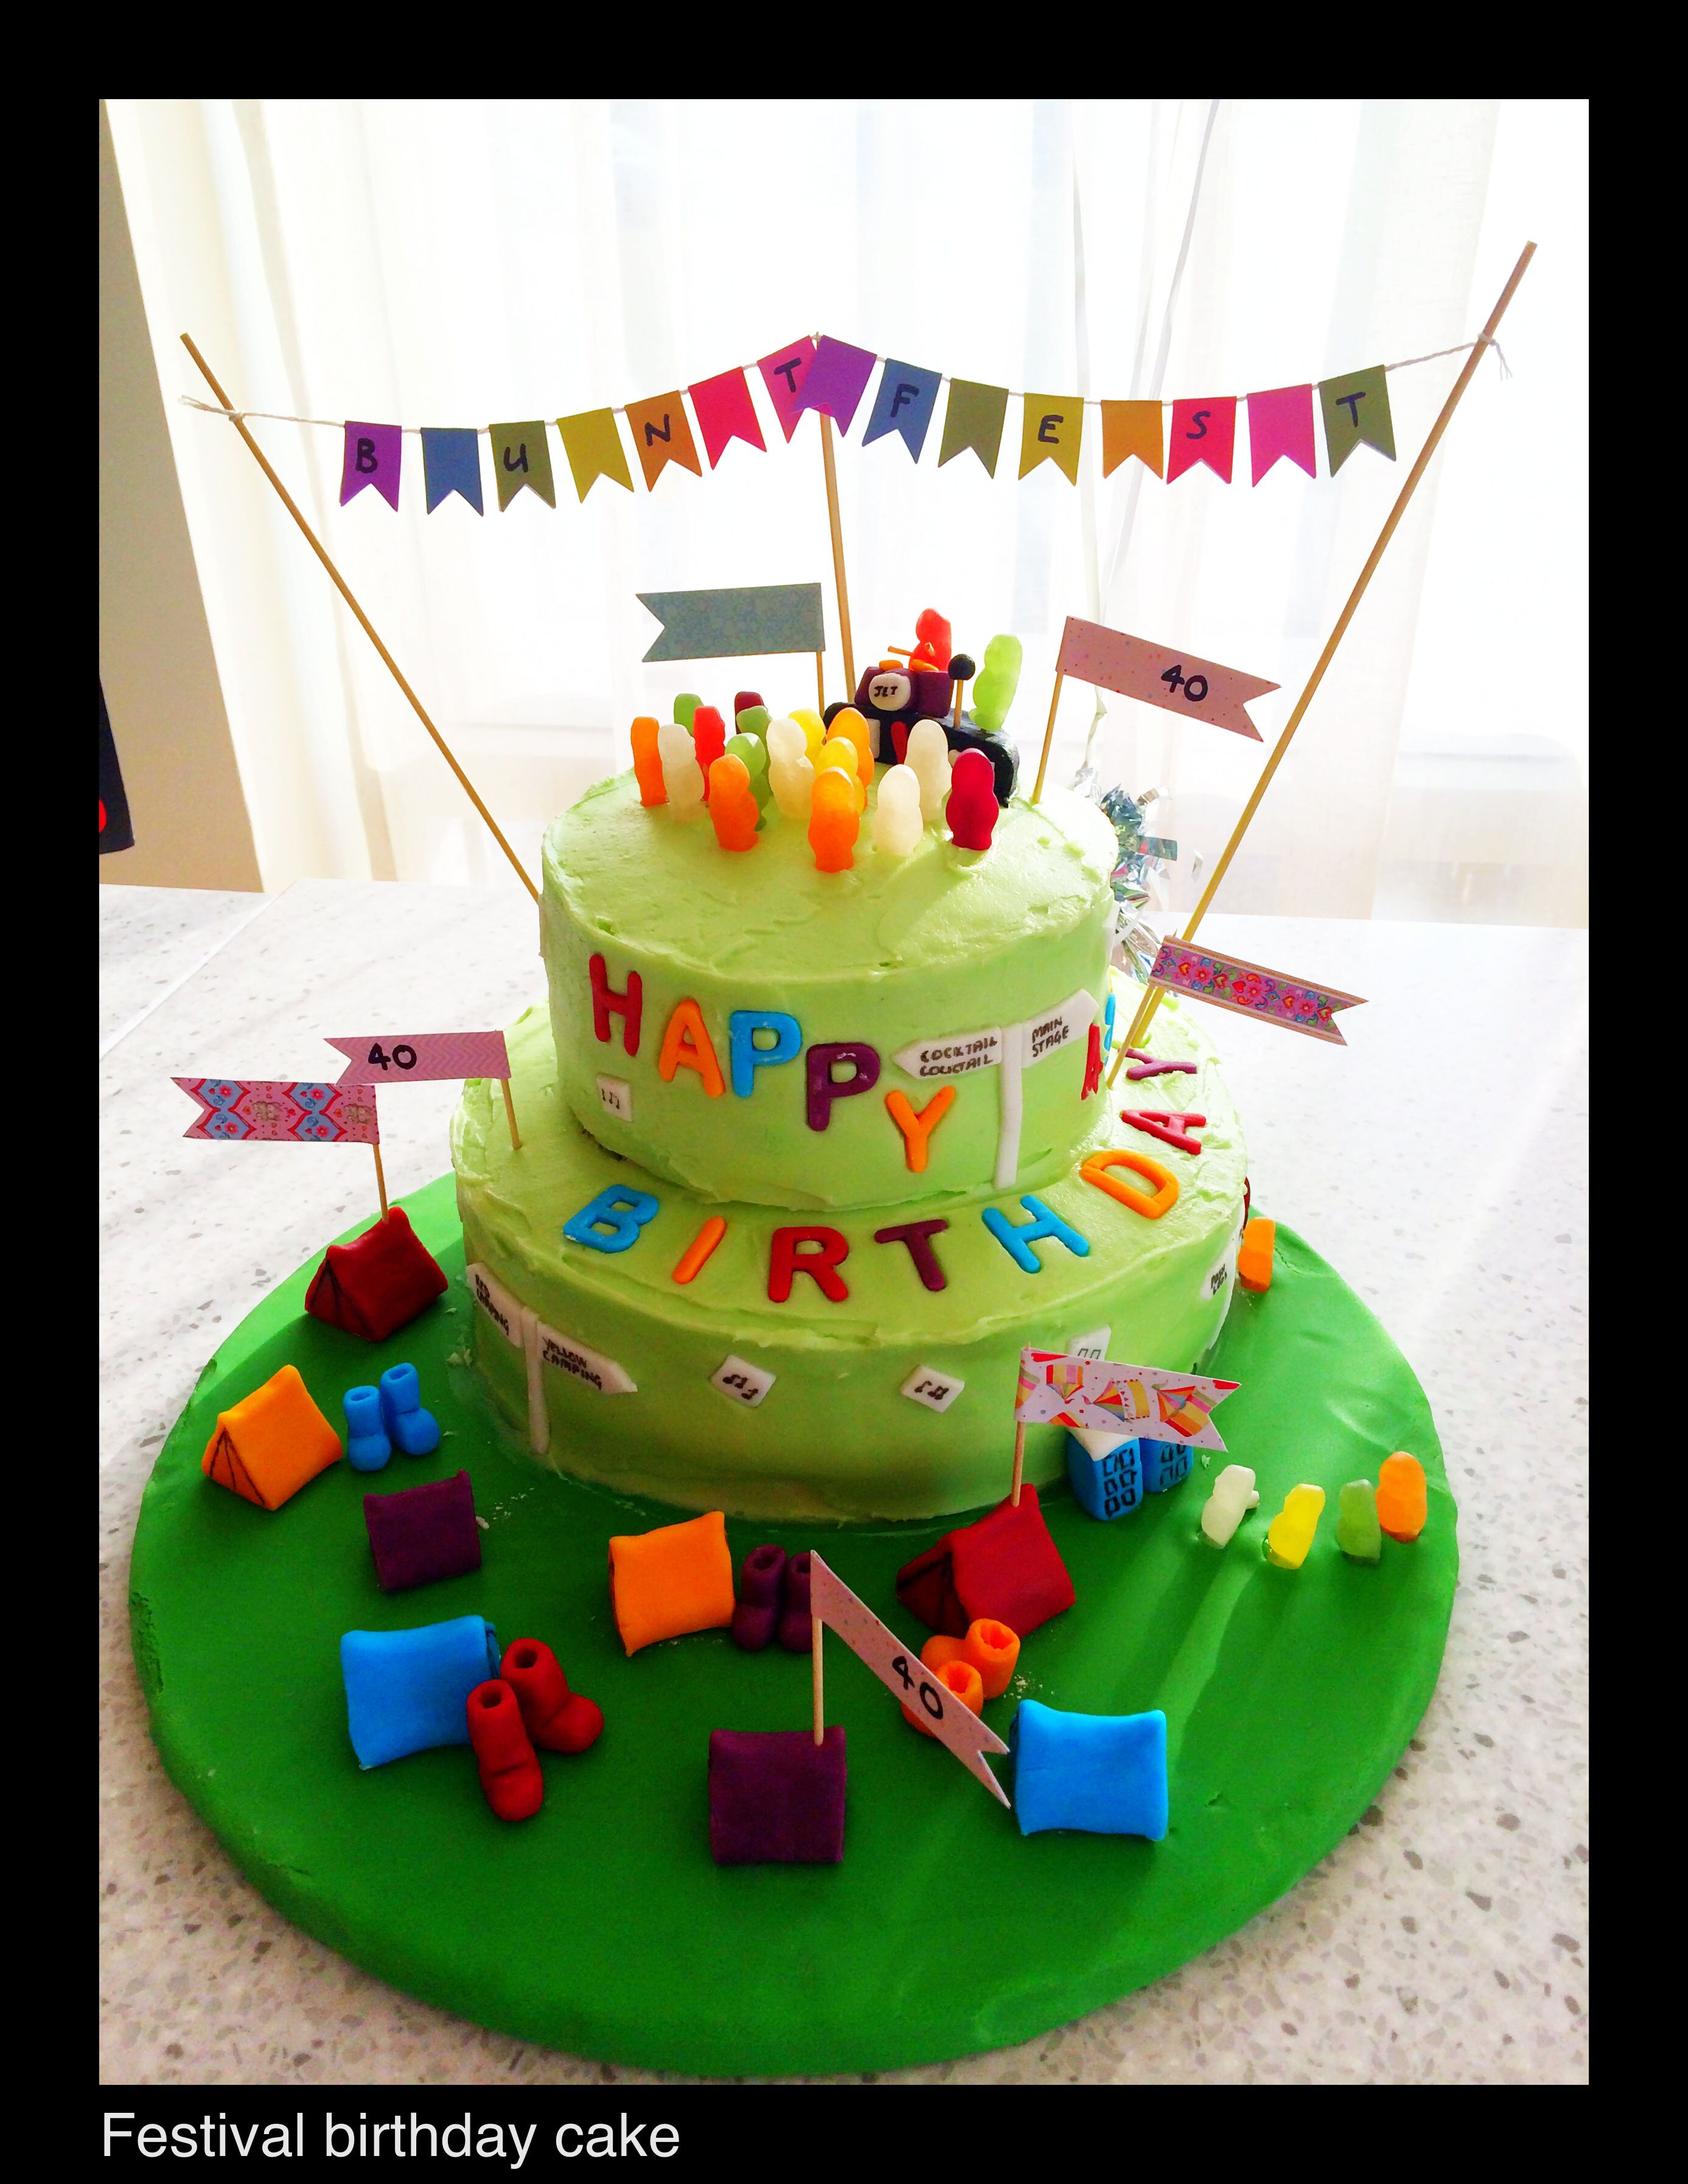 Festival Birthday Cake For 40Th Birthday